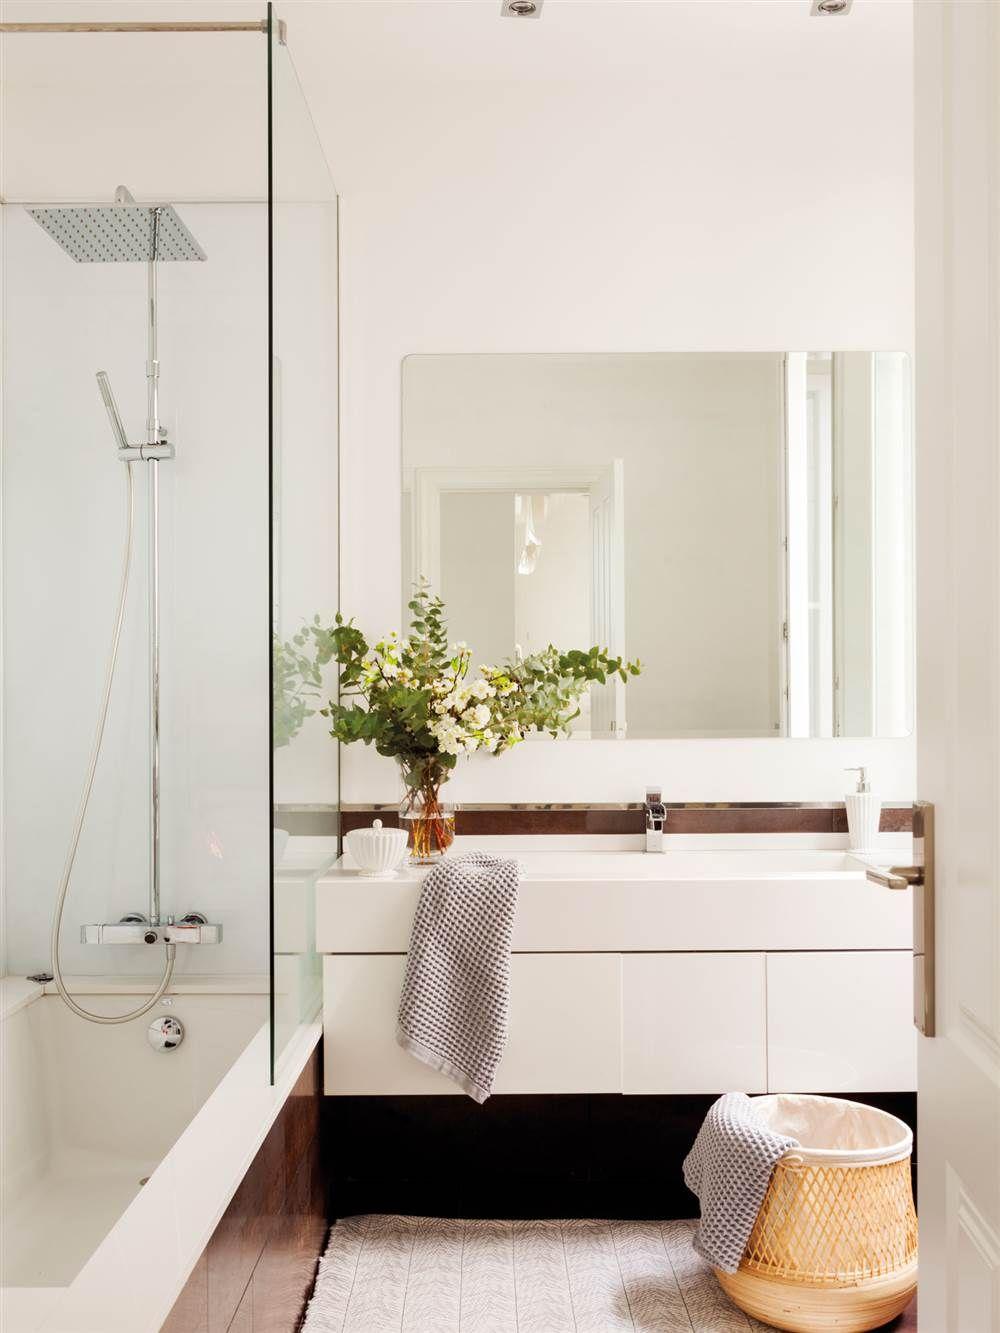 Reforma tu baño según tu presupuesto | CUARTO DE BAÑO | Pinterest ...